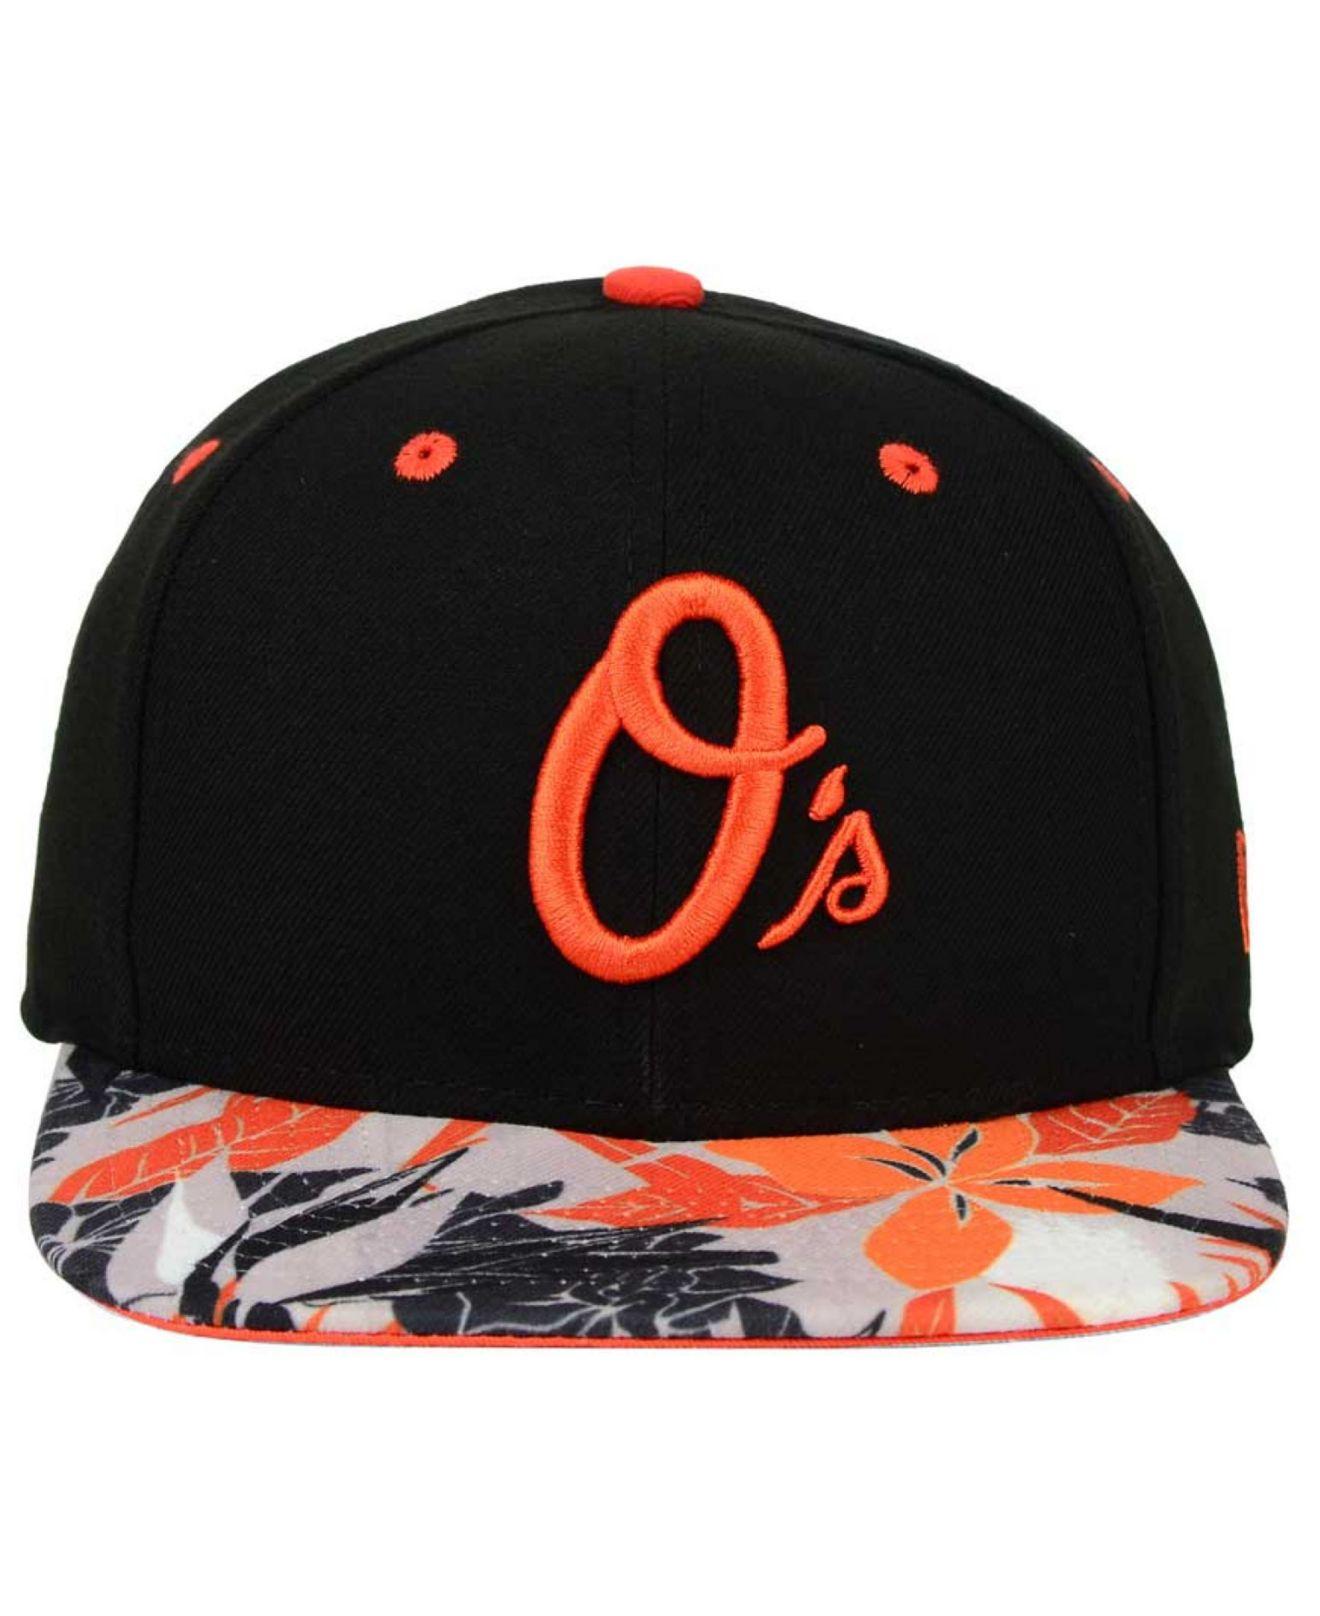 06c45952960 Lyst - KTZ Baltimore Orioles Floral Viz 9fifty Snapback Cap in Black ...